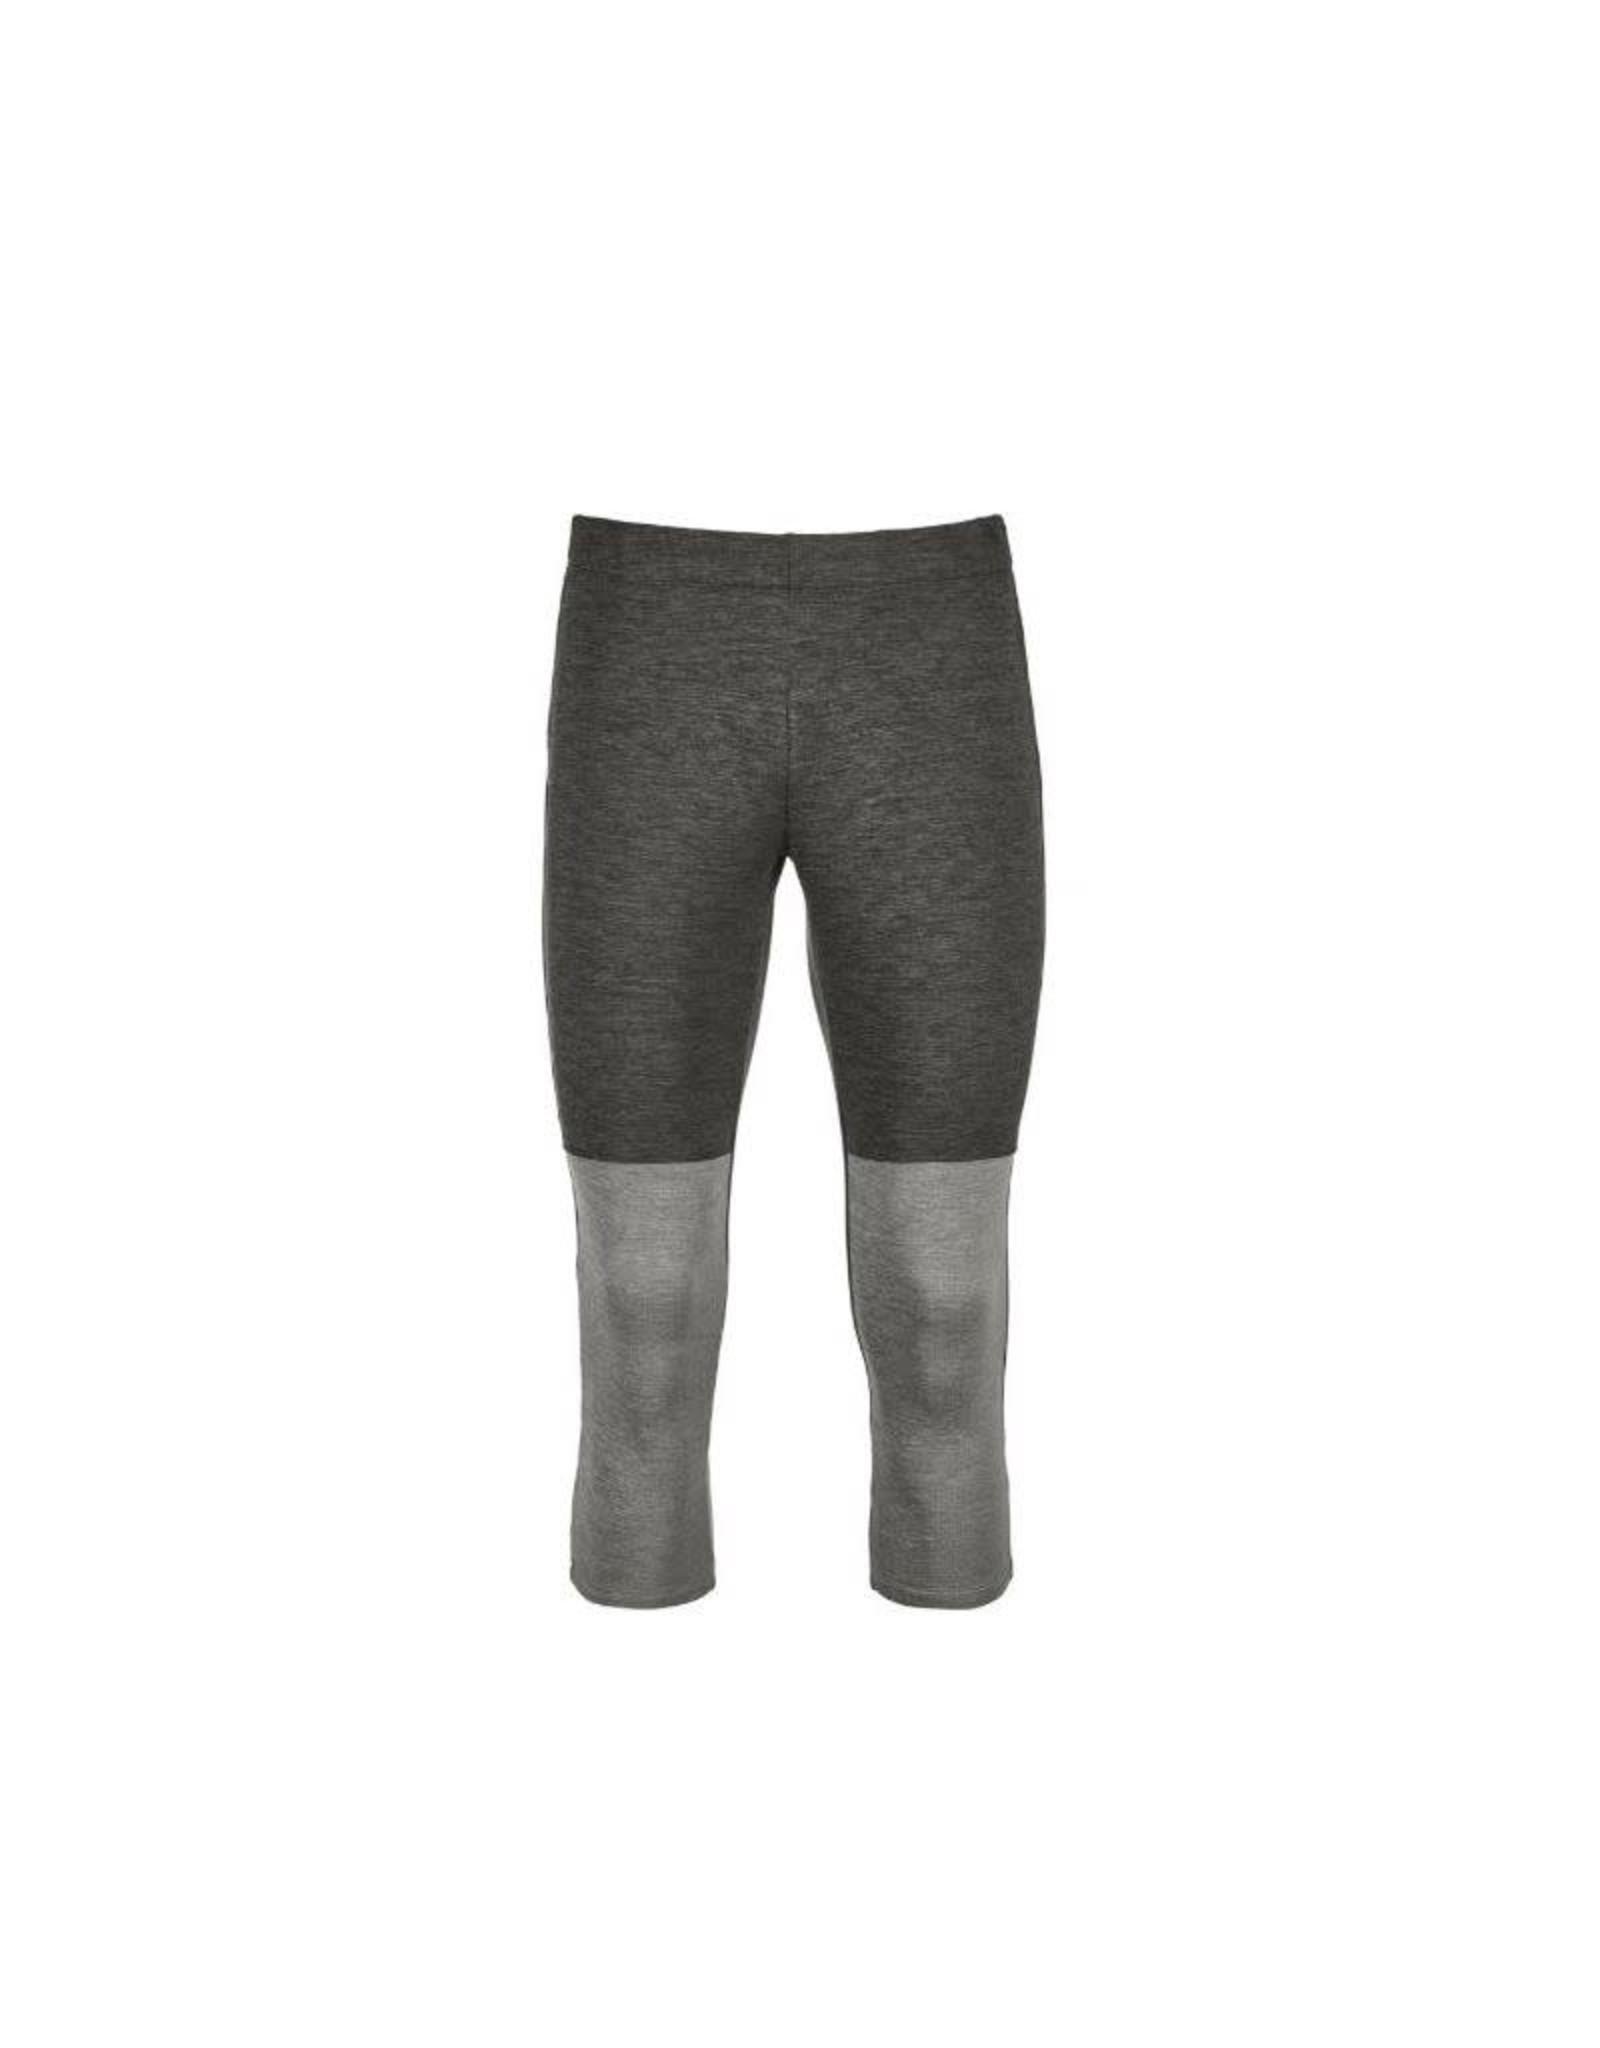 Ortovox Ortovox Fleece Light Short Pants - Men